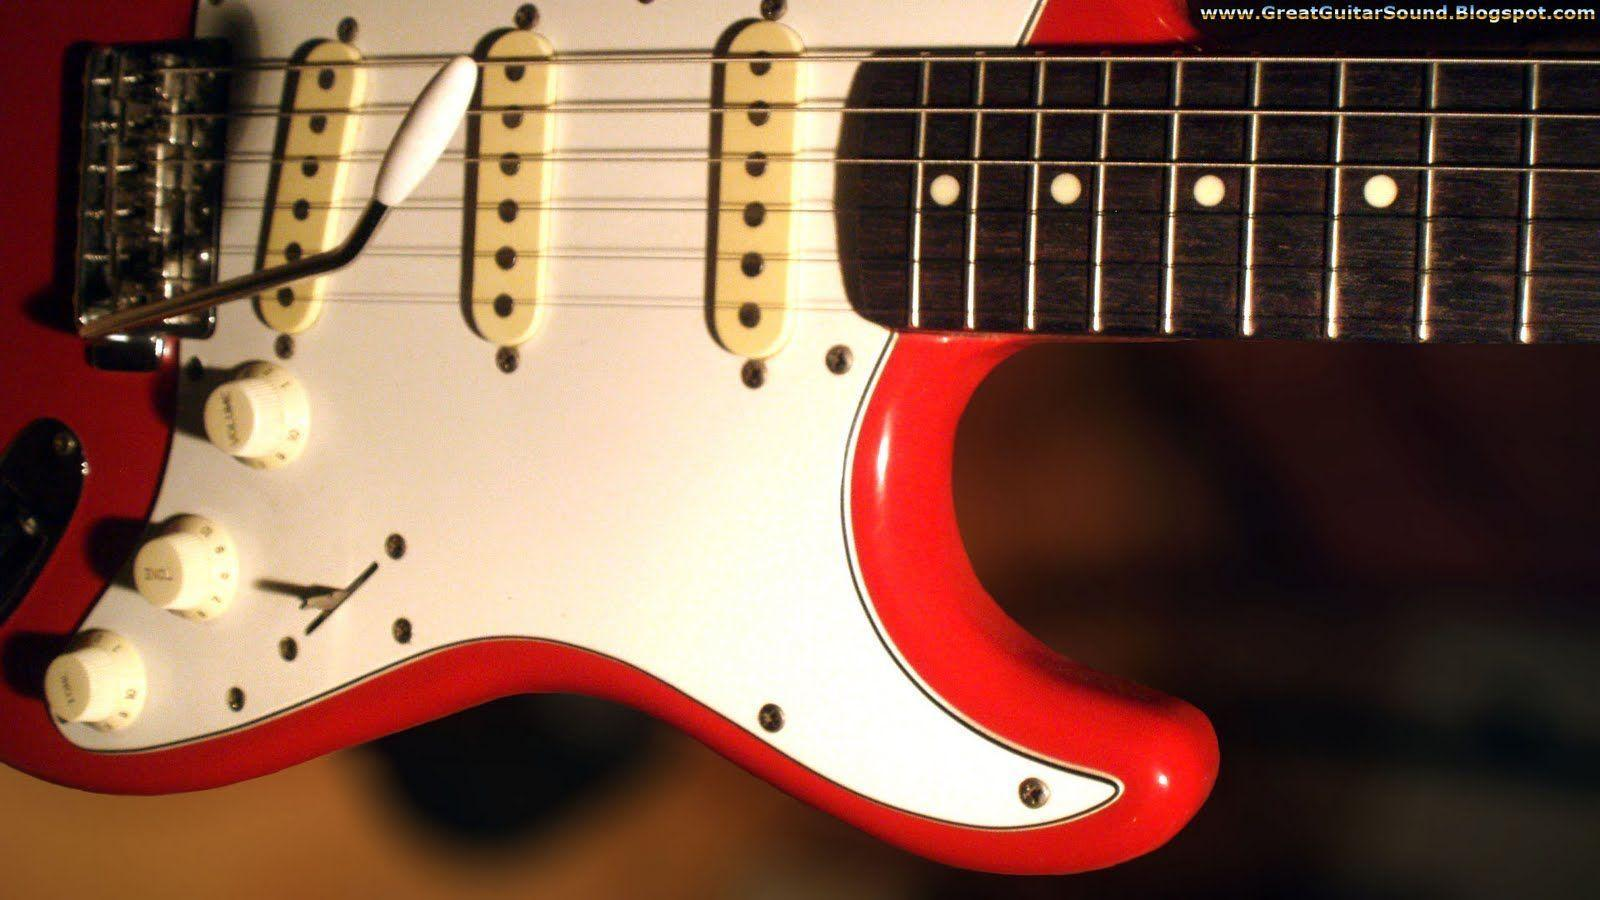 Fender Guitar Wallpapers 1600x900